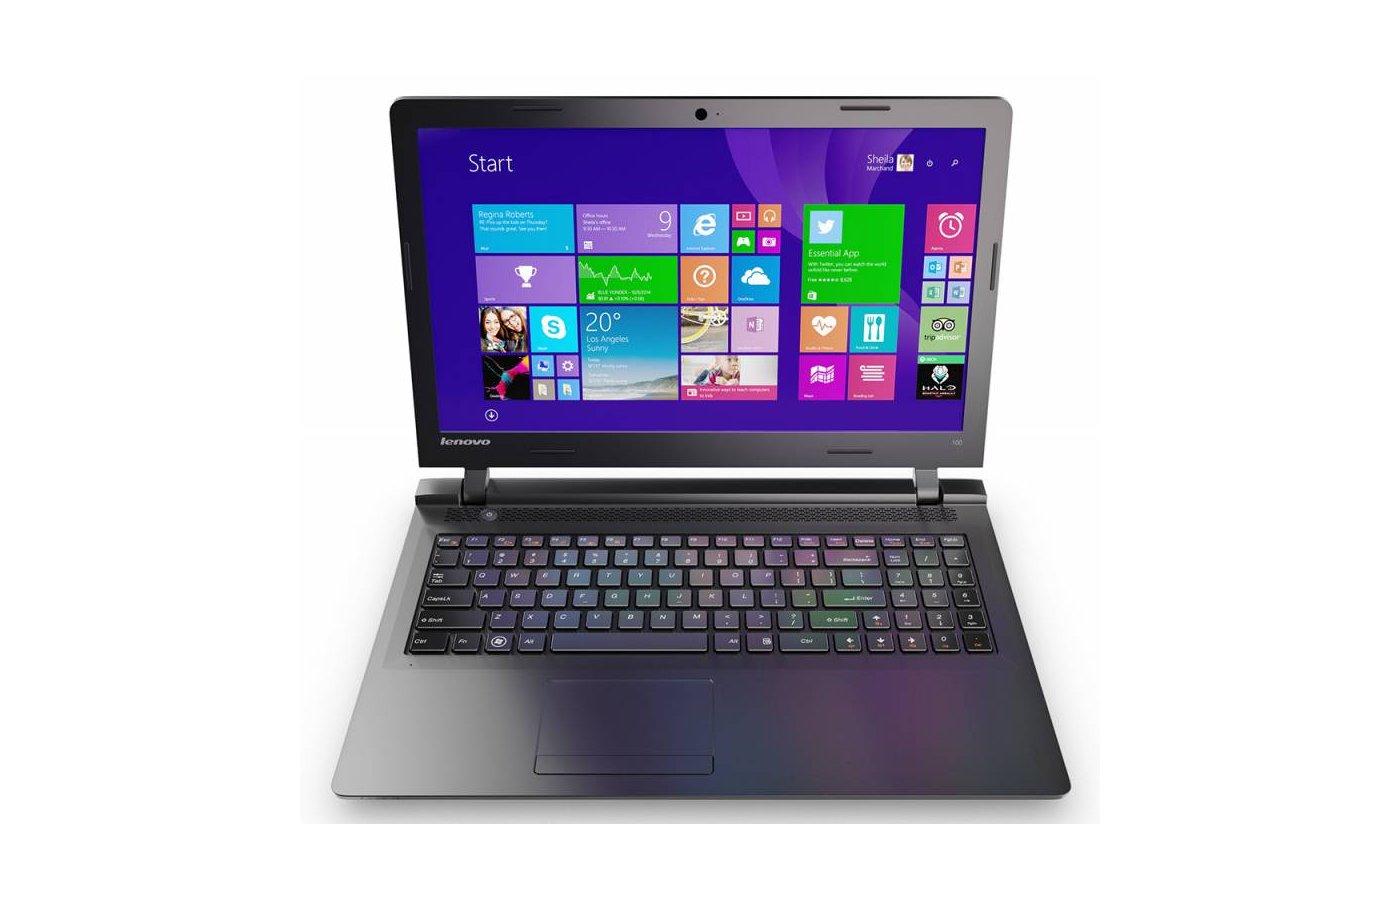 Ноутбук Lenovo IdeaPad 100-15 /80MJ005HRK/ intel N3540/4Gb/500Gb/GMA HD/DVDRW/15.6/WiFi/Win8